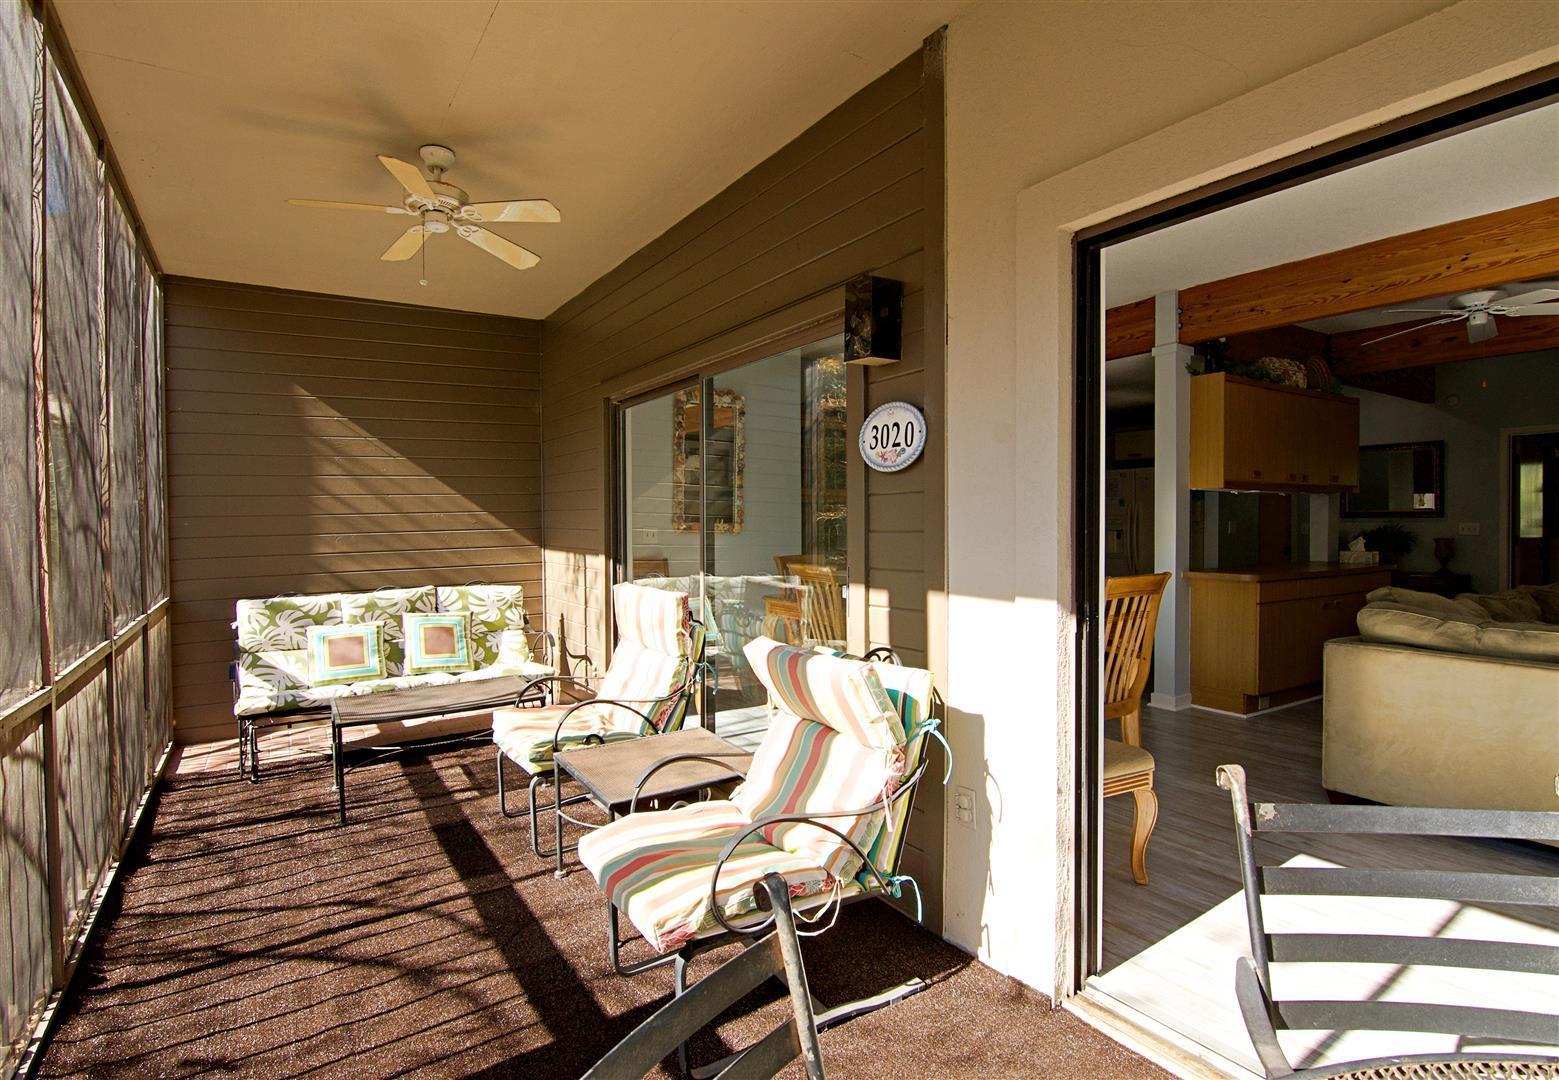 Seabrook Island Homes For Sale - 3020 Ocean Winds, Seabrook Island, SC - 11